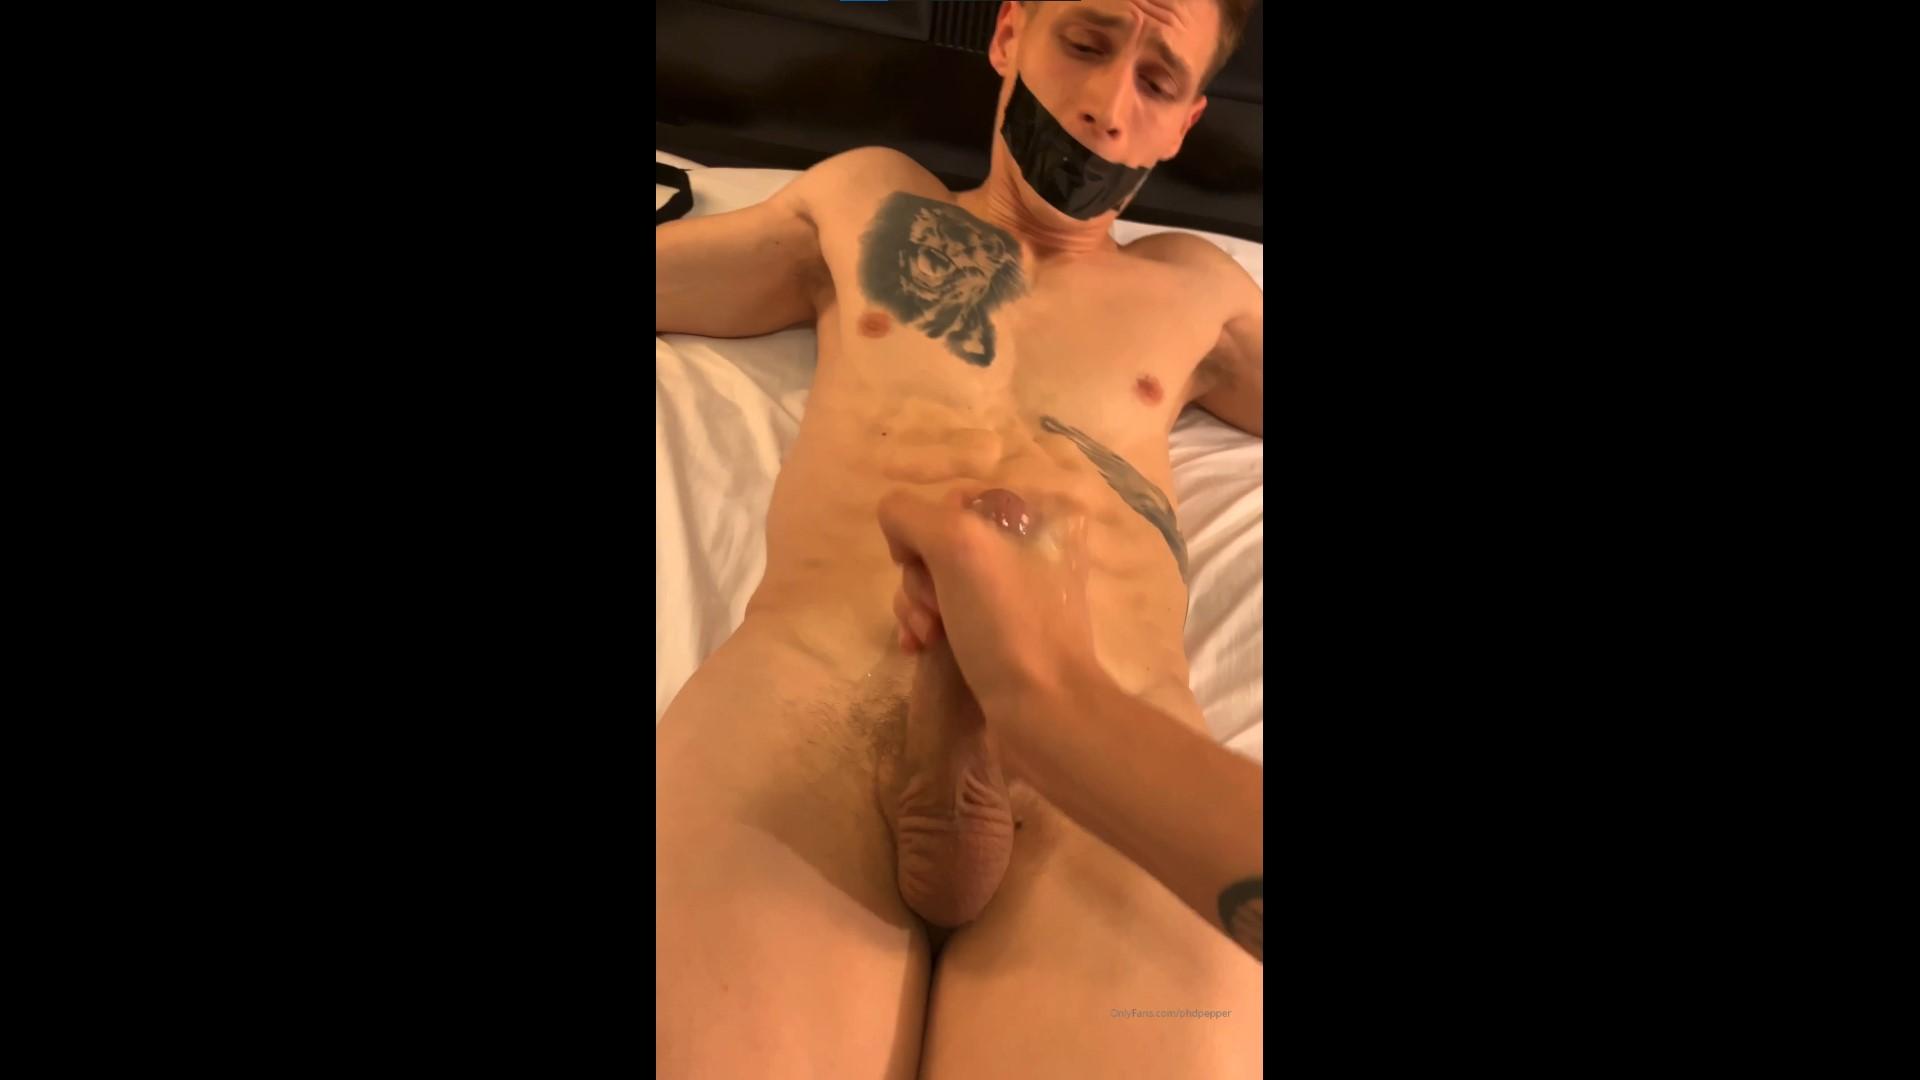 Getting a handjob while being restrained - Daniel Jensen (phdpepper)